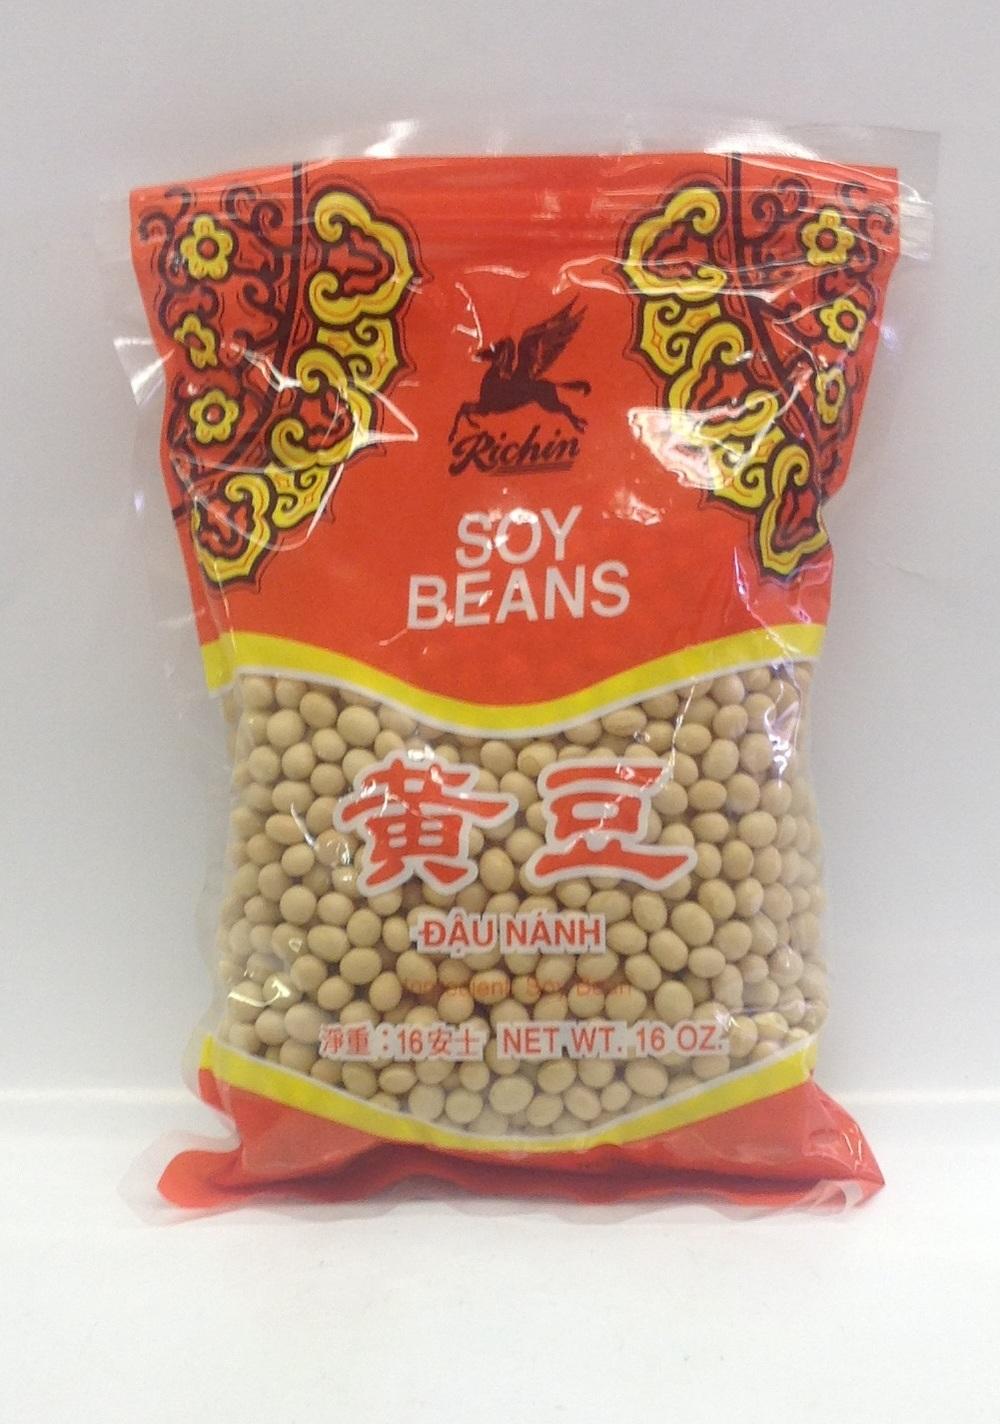 Dried Soy Bean   Richin   DRVB0030 50x16 oz